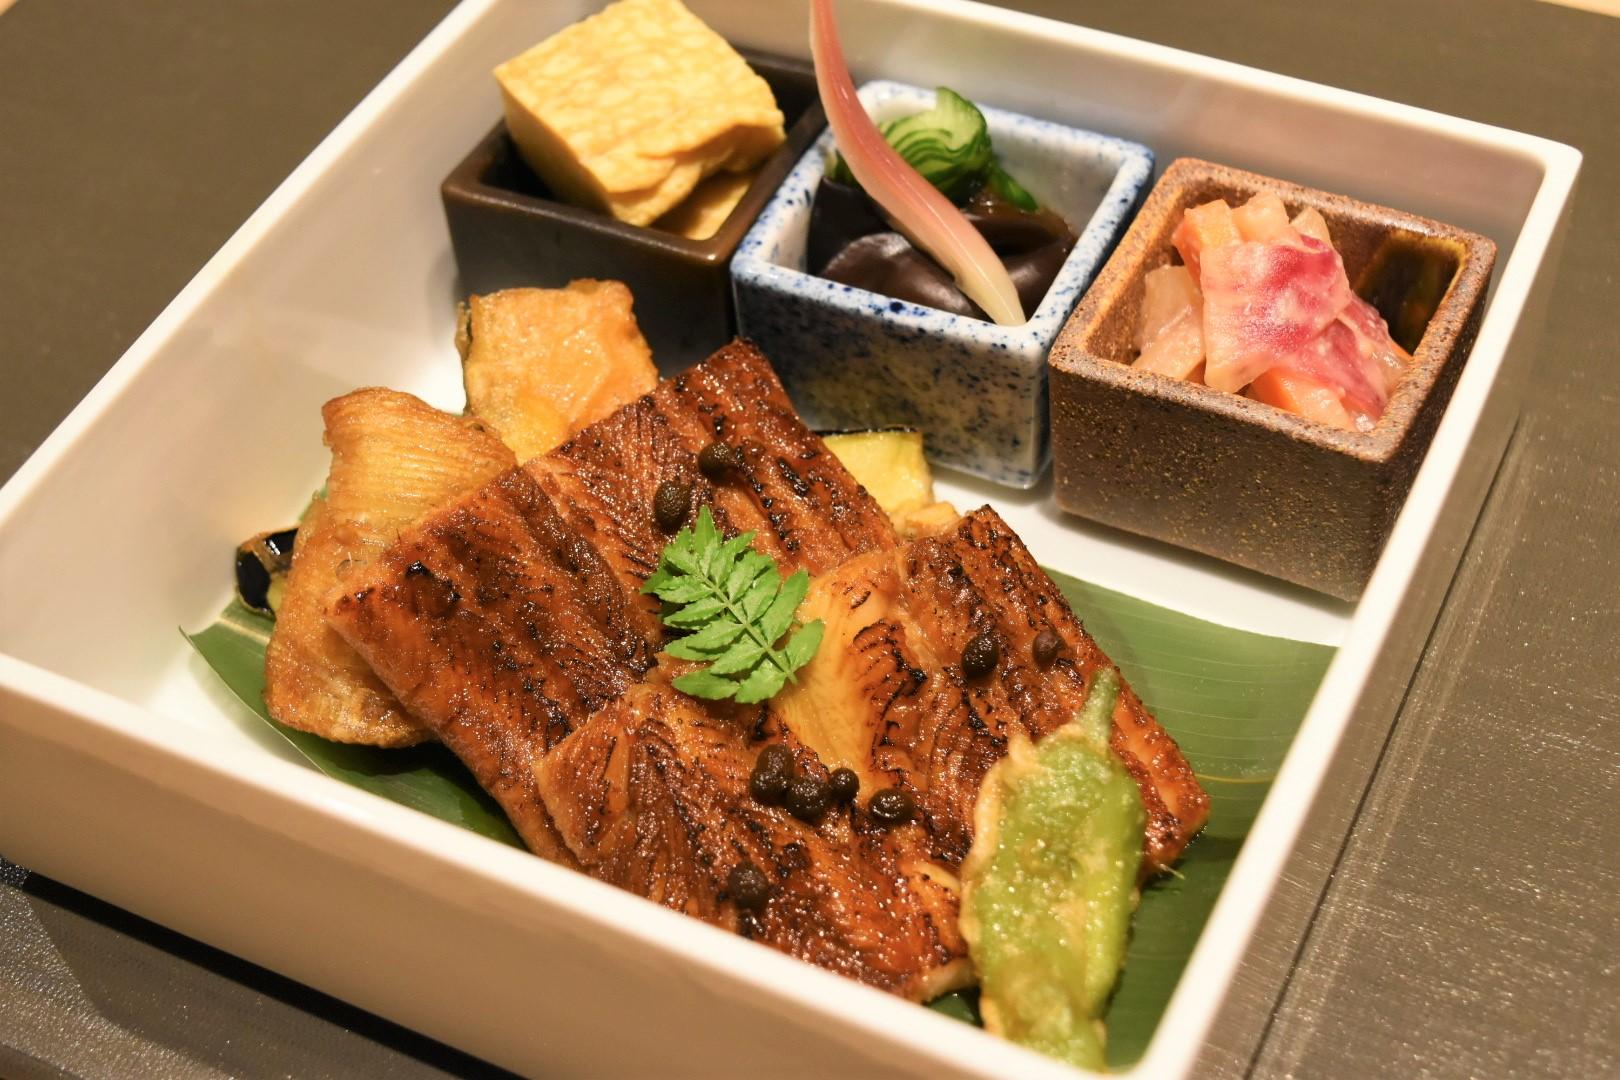 ginza-%e8%b1%89-kuki-ginza-japanese-restaurant-%e9%8a%80%e5%ba%a7%e6%97%a5%e6%9c%ac%e6%96%99%e7%90%862